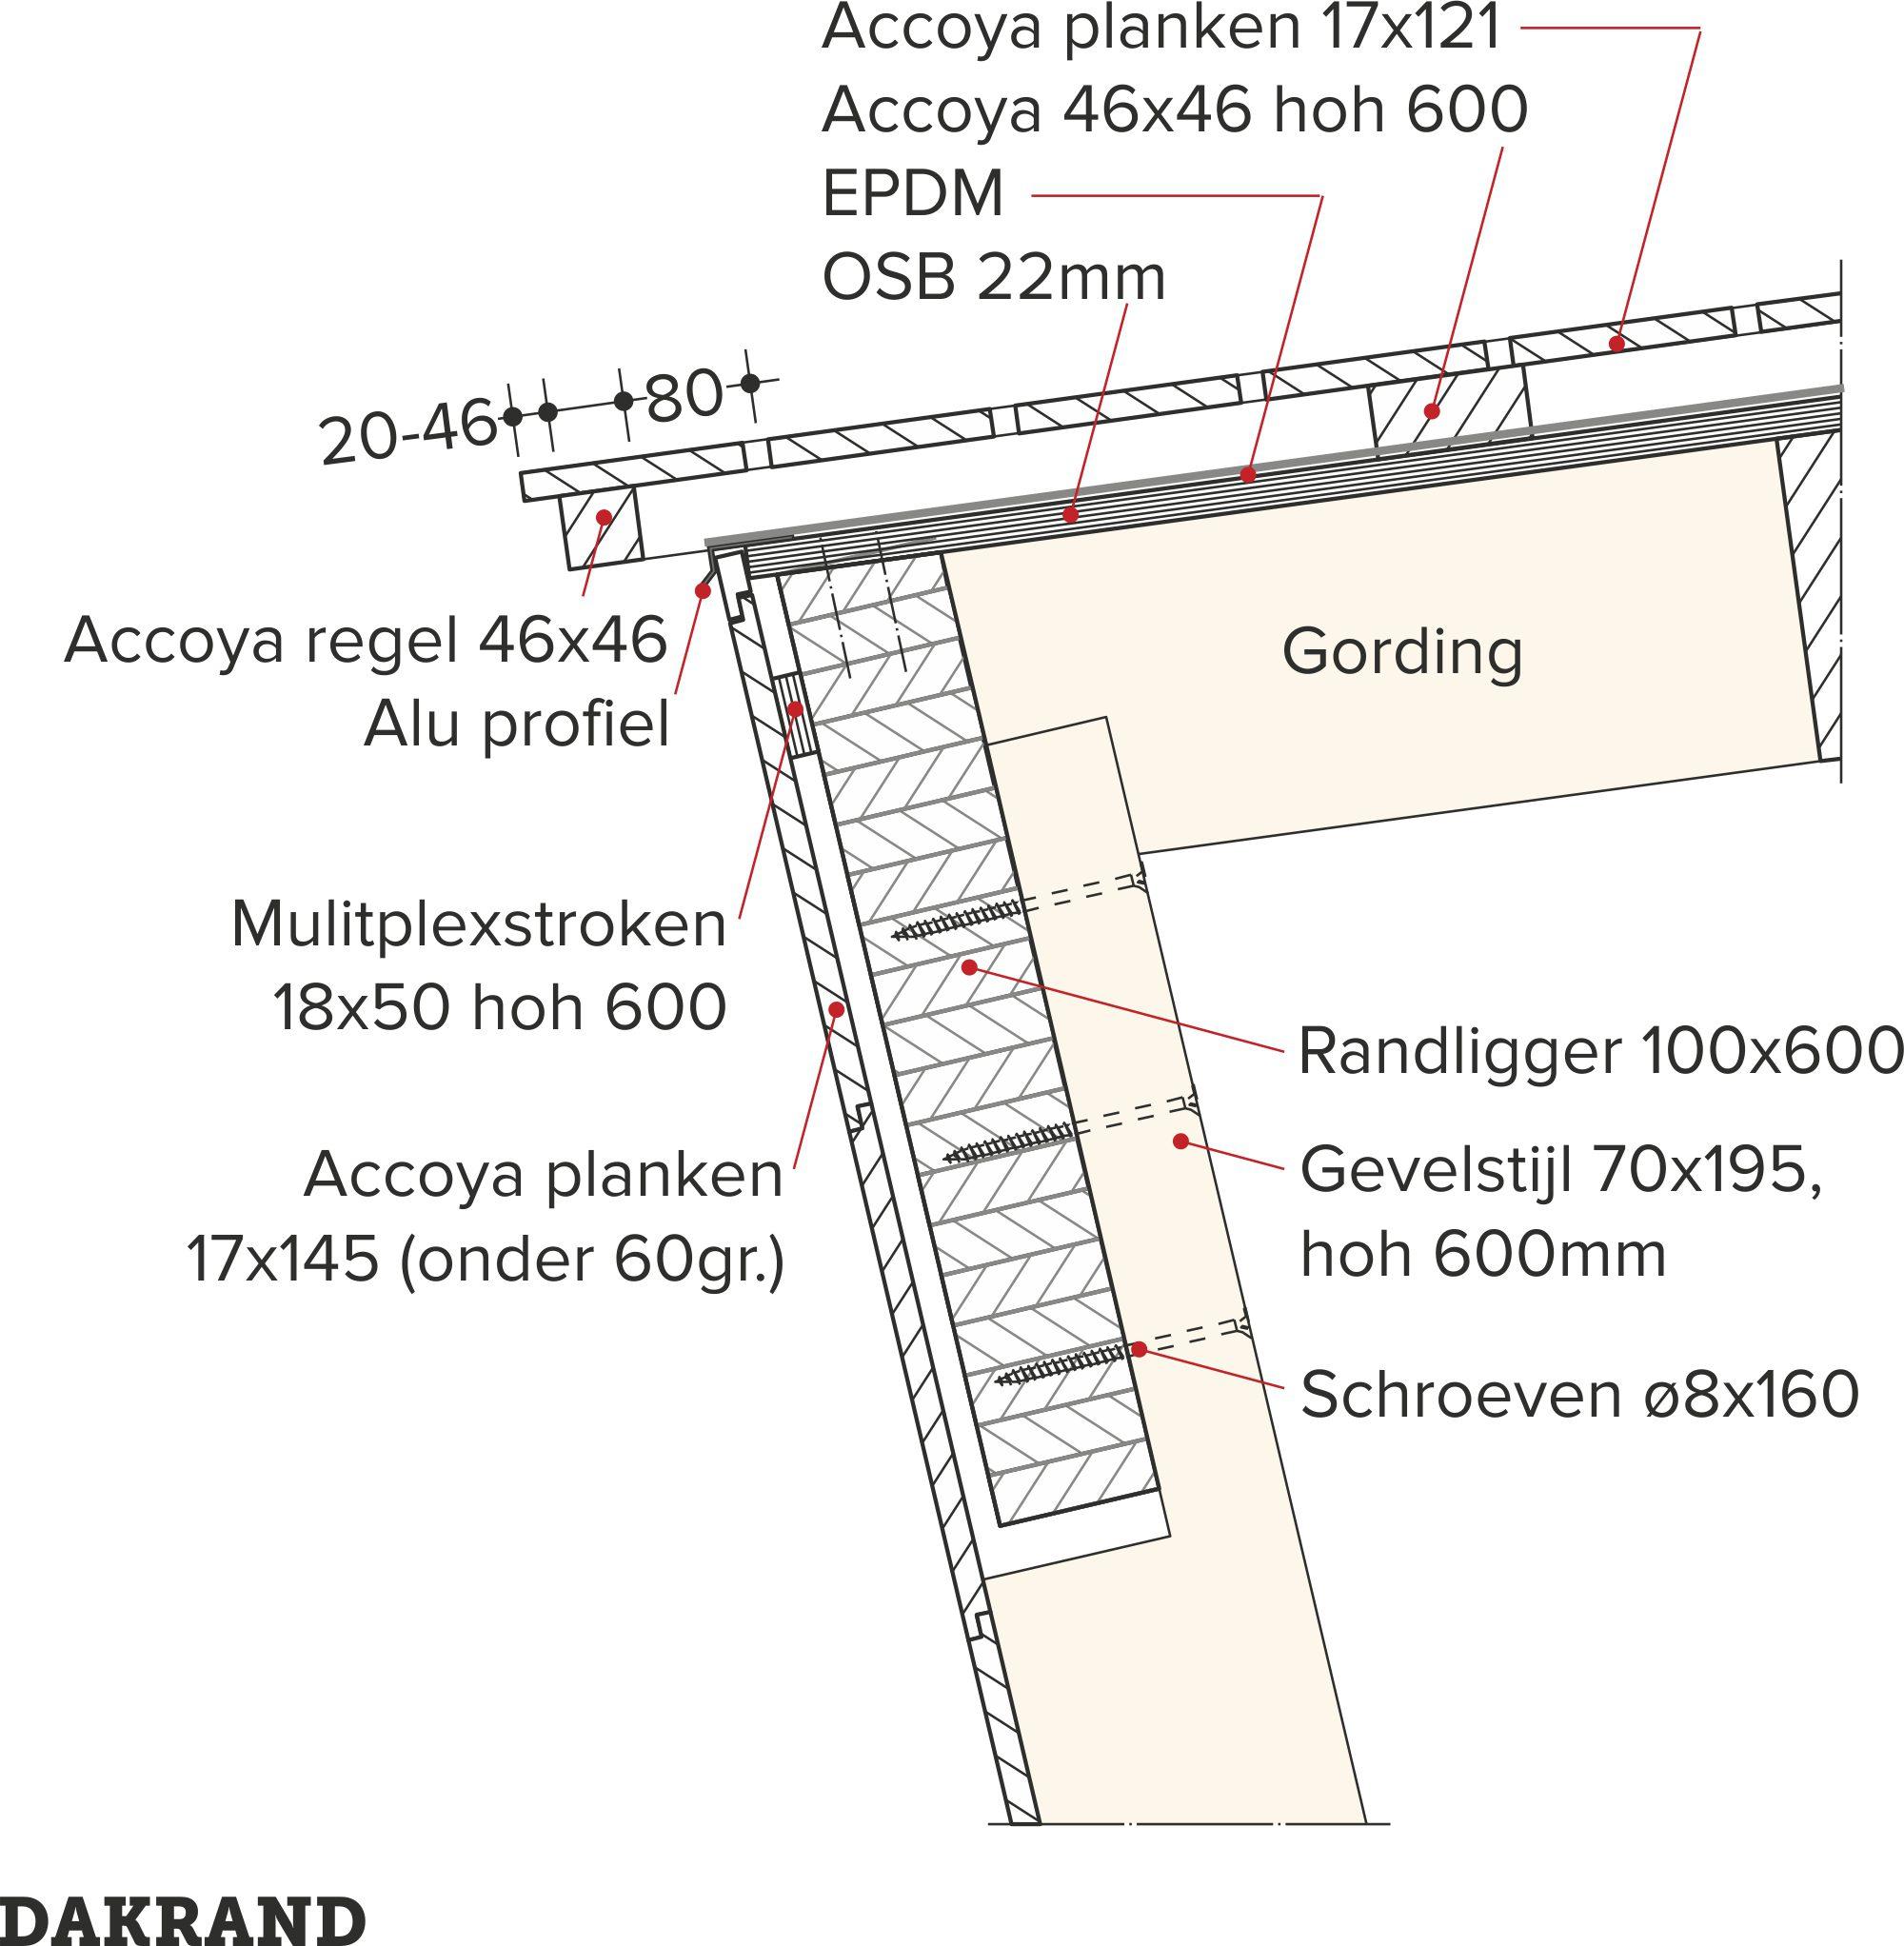 Accoya-hout, detail dakrand, epdm